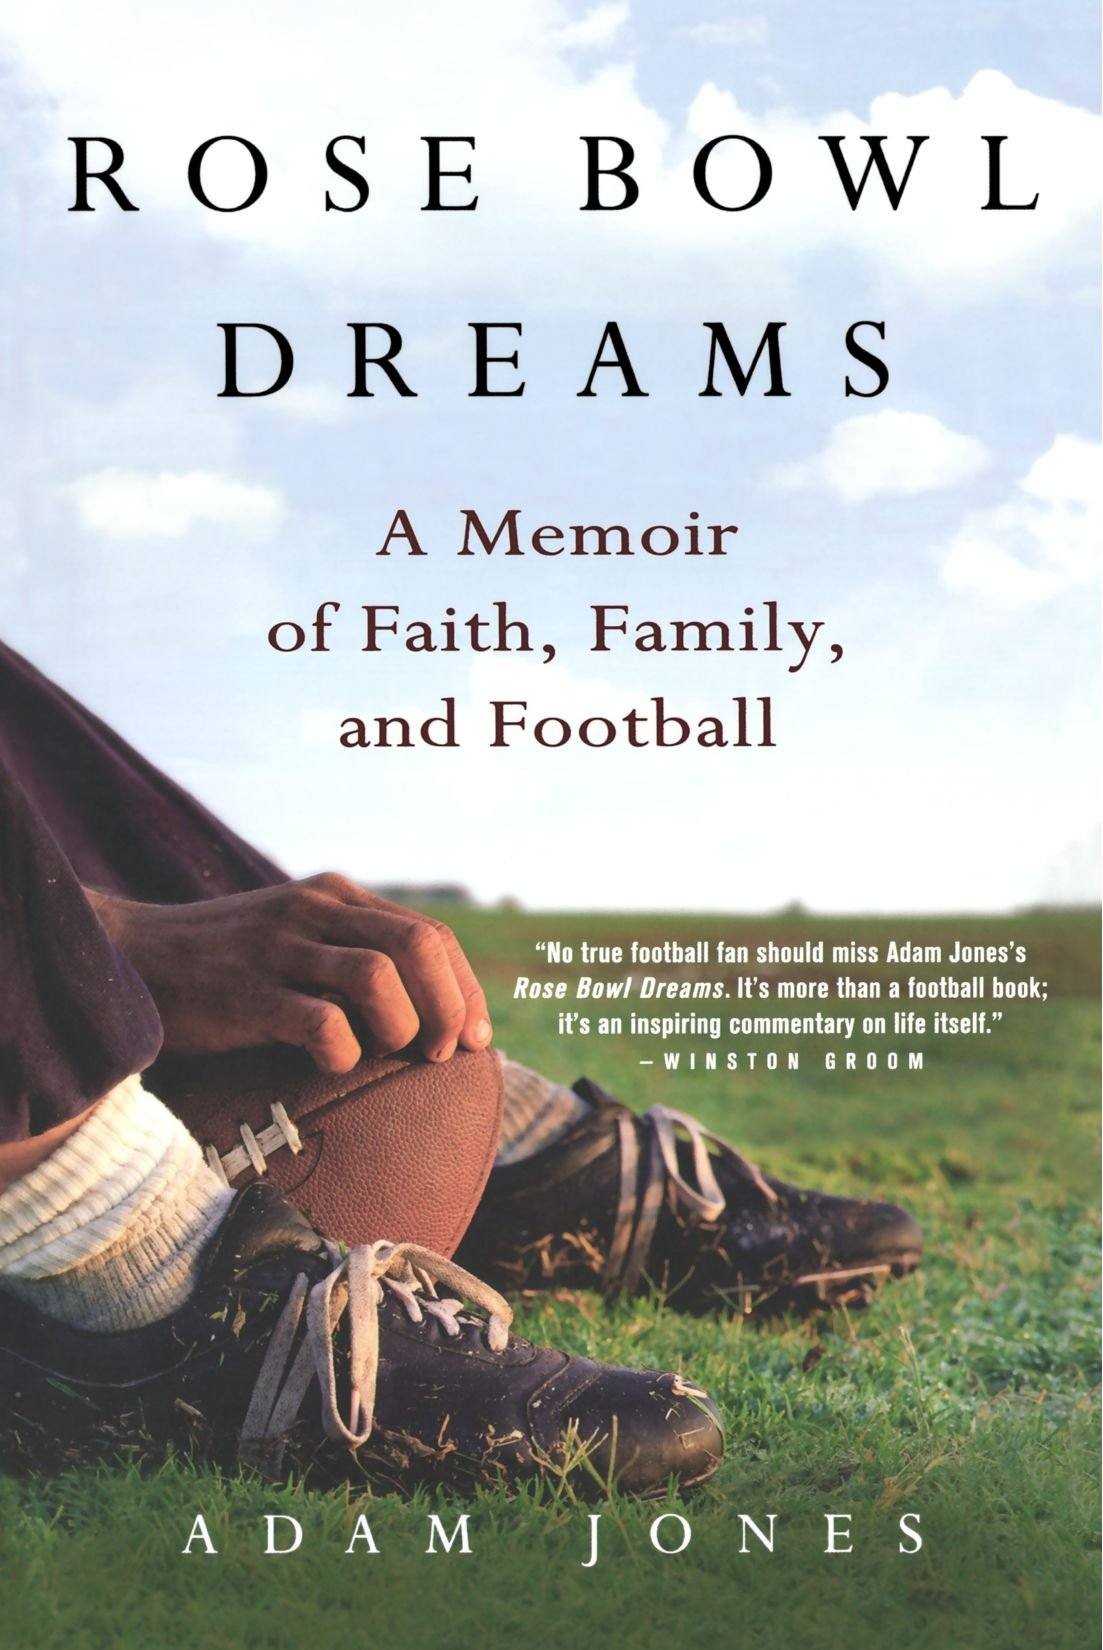 Rose Bowl Dreams: A Memoir of Faith, Family, and Football pdf epub